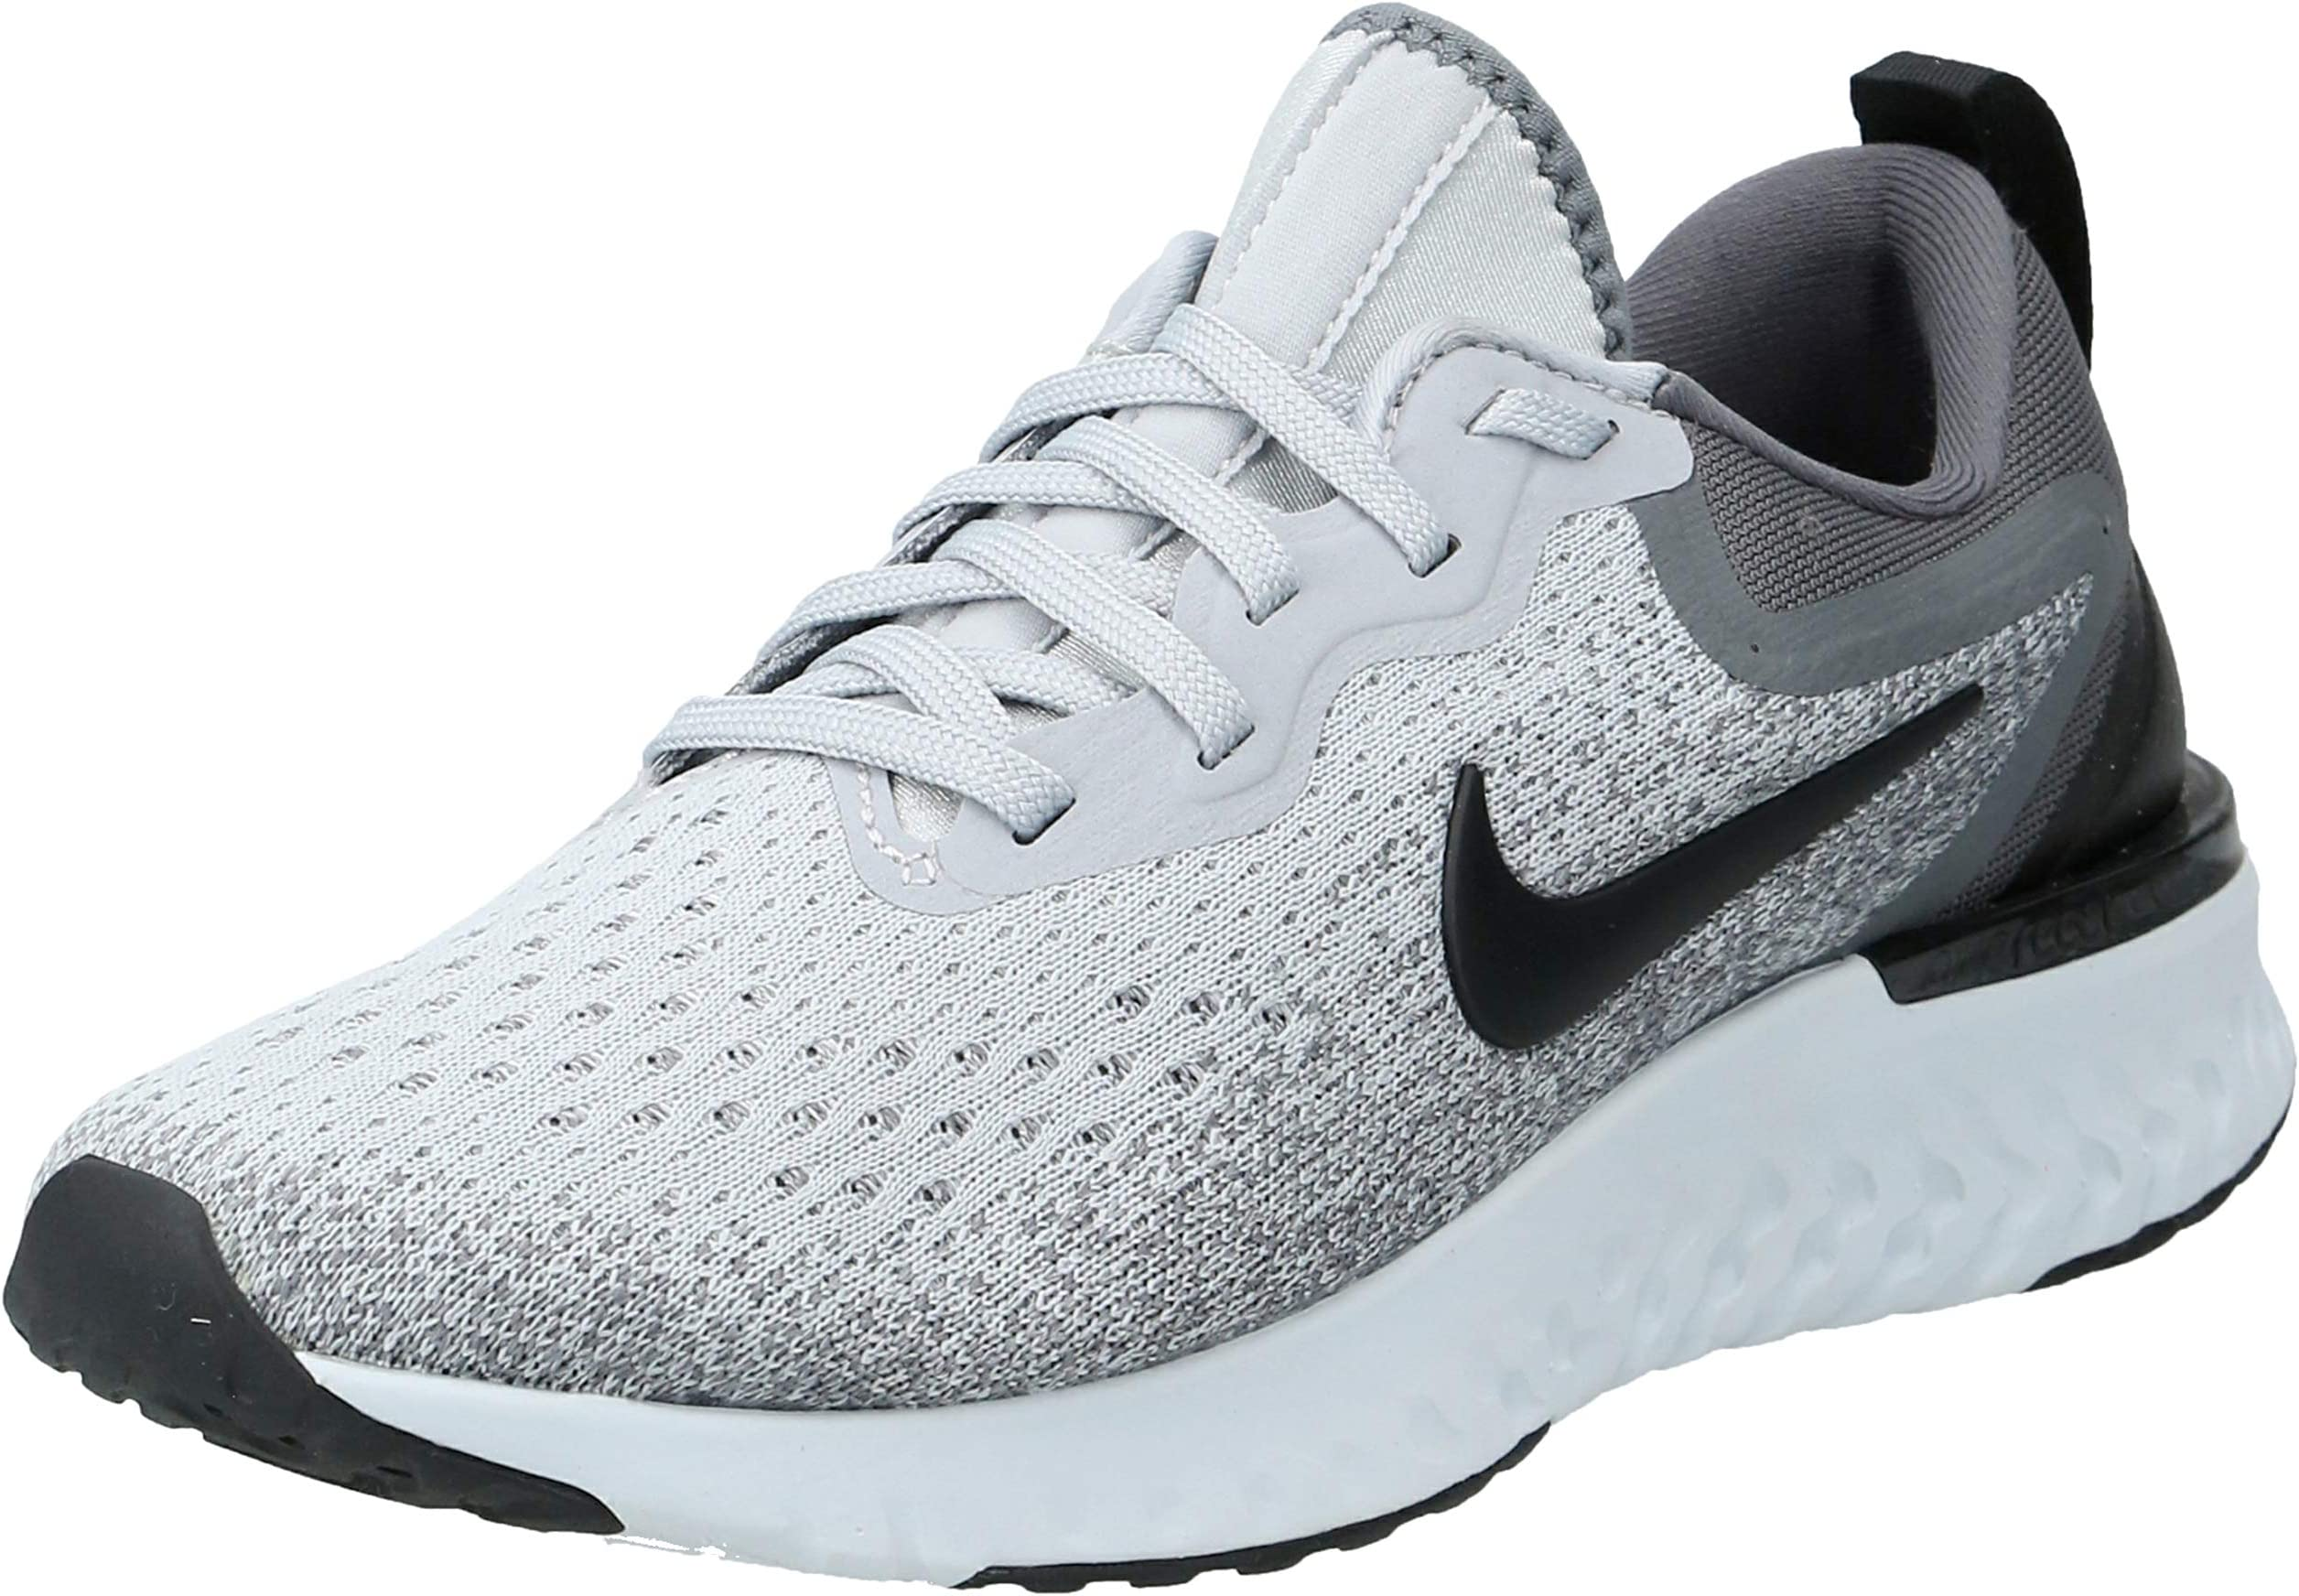 tubo respirador Pericia circuito  Nike Odyssey React Women's Road Running Shoes price in UAE | Amazon UAE |  kanbkam